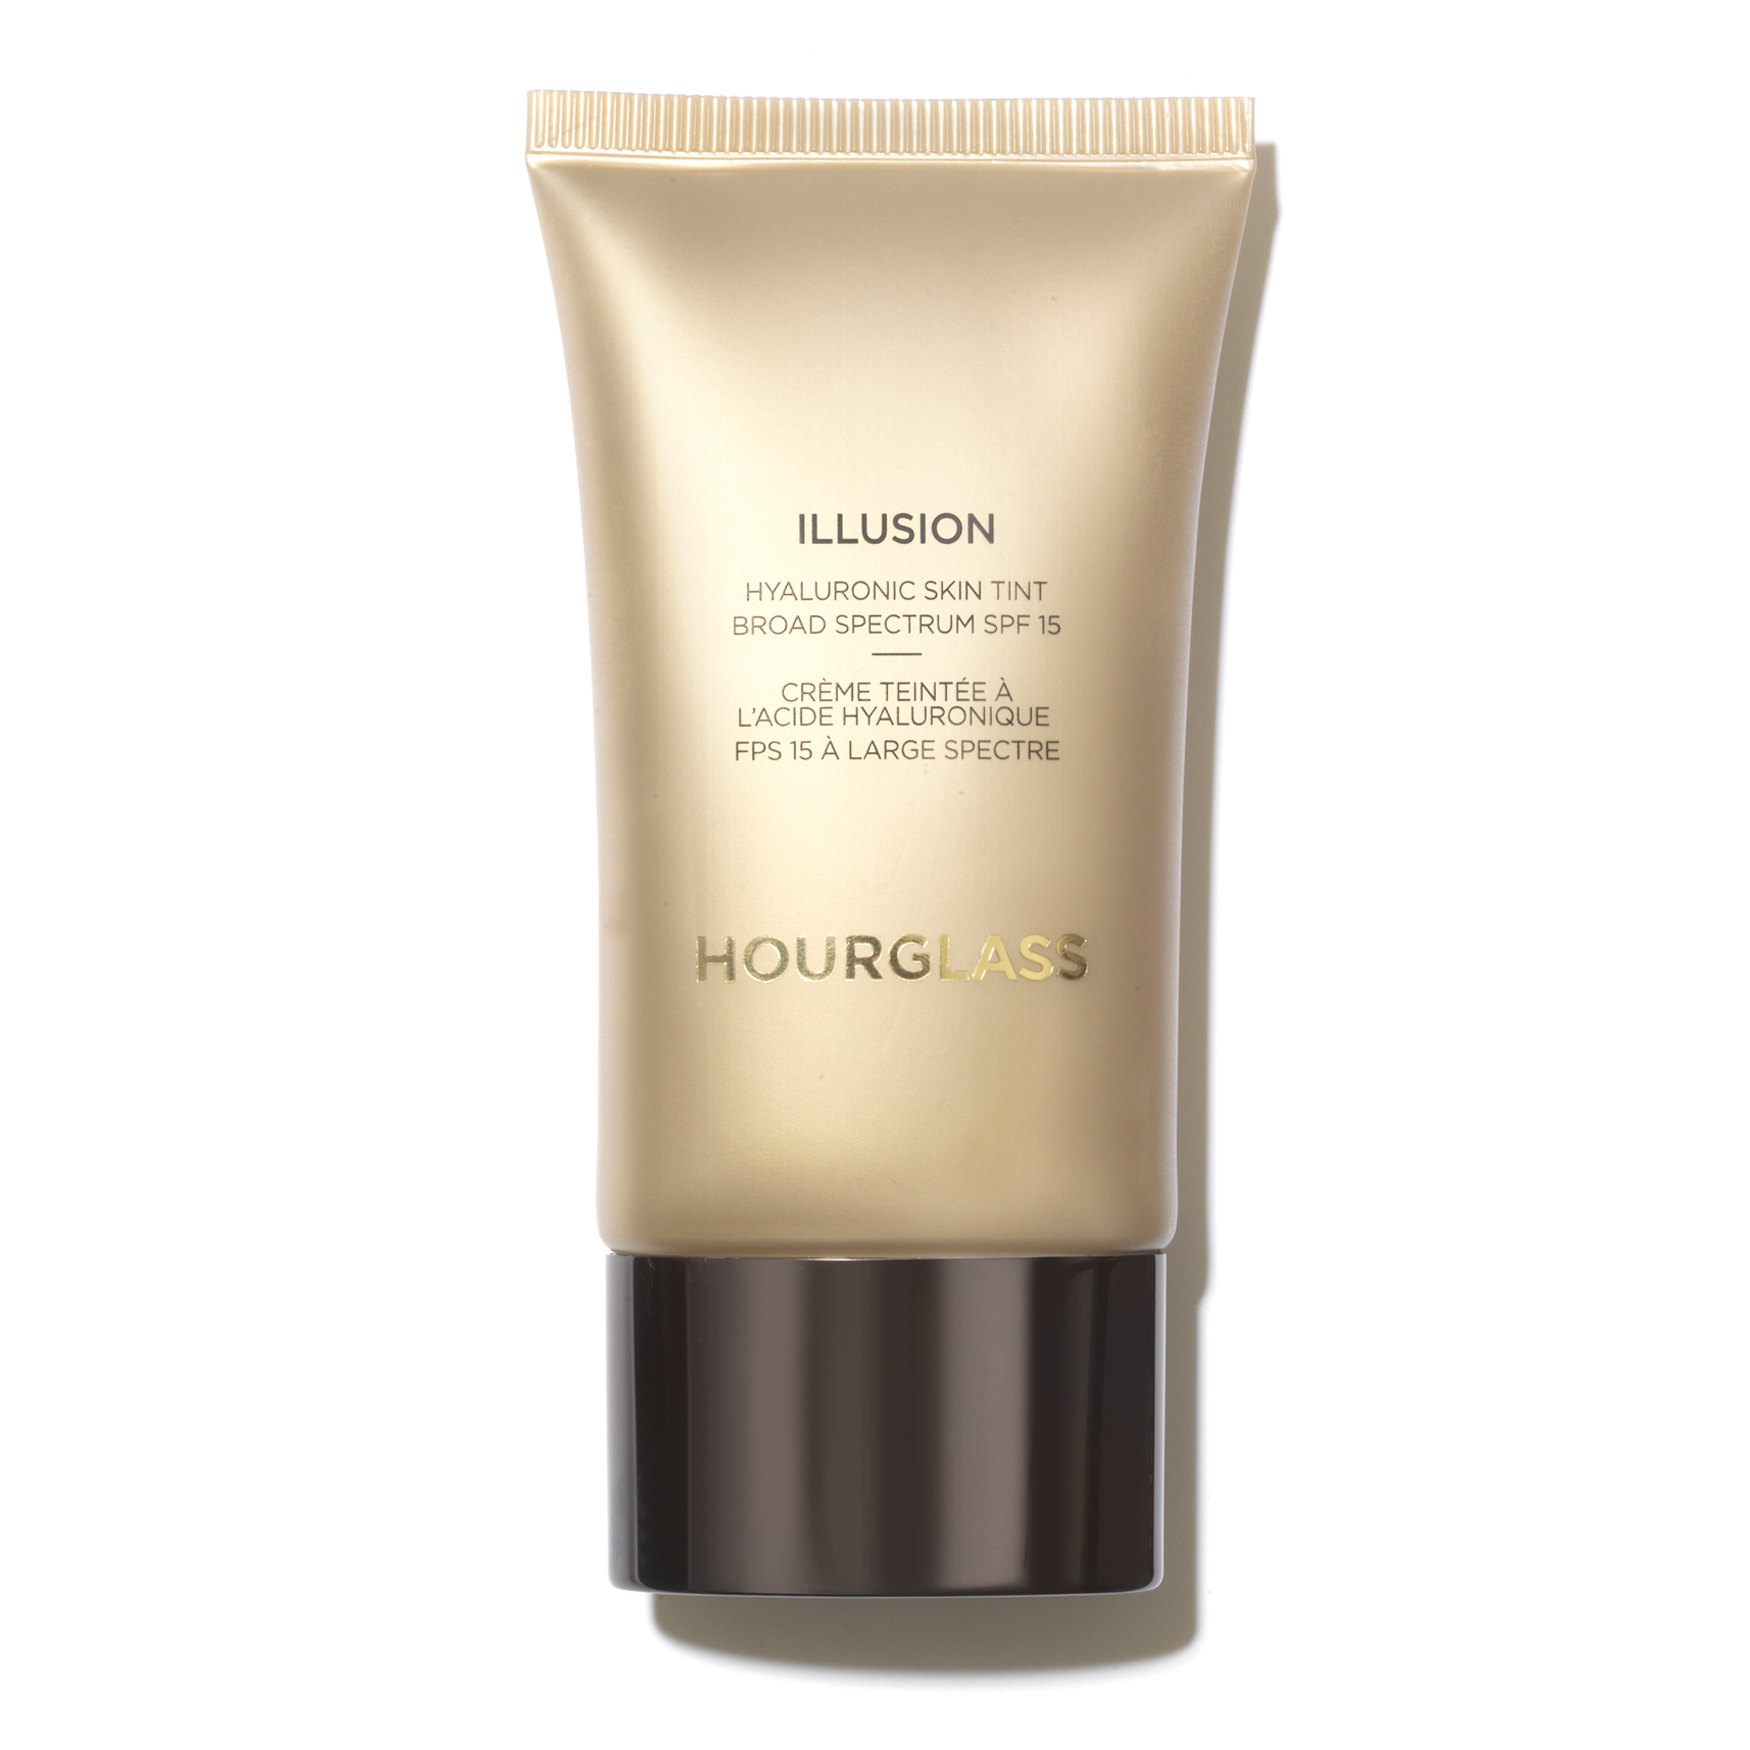 Illusion Hyaluronic Skin Tint SPF15, NUDE, large